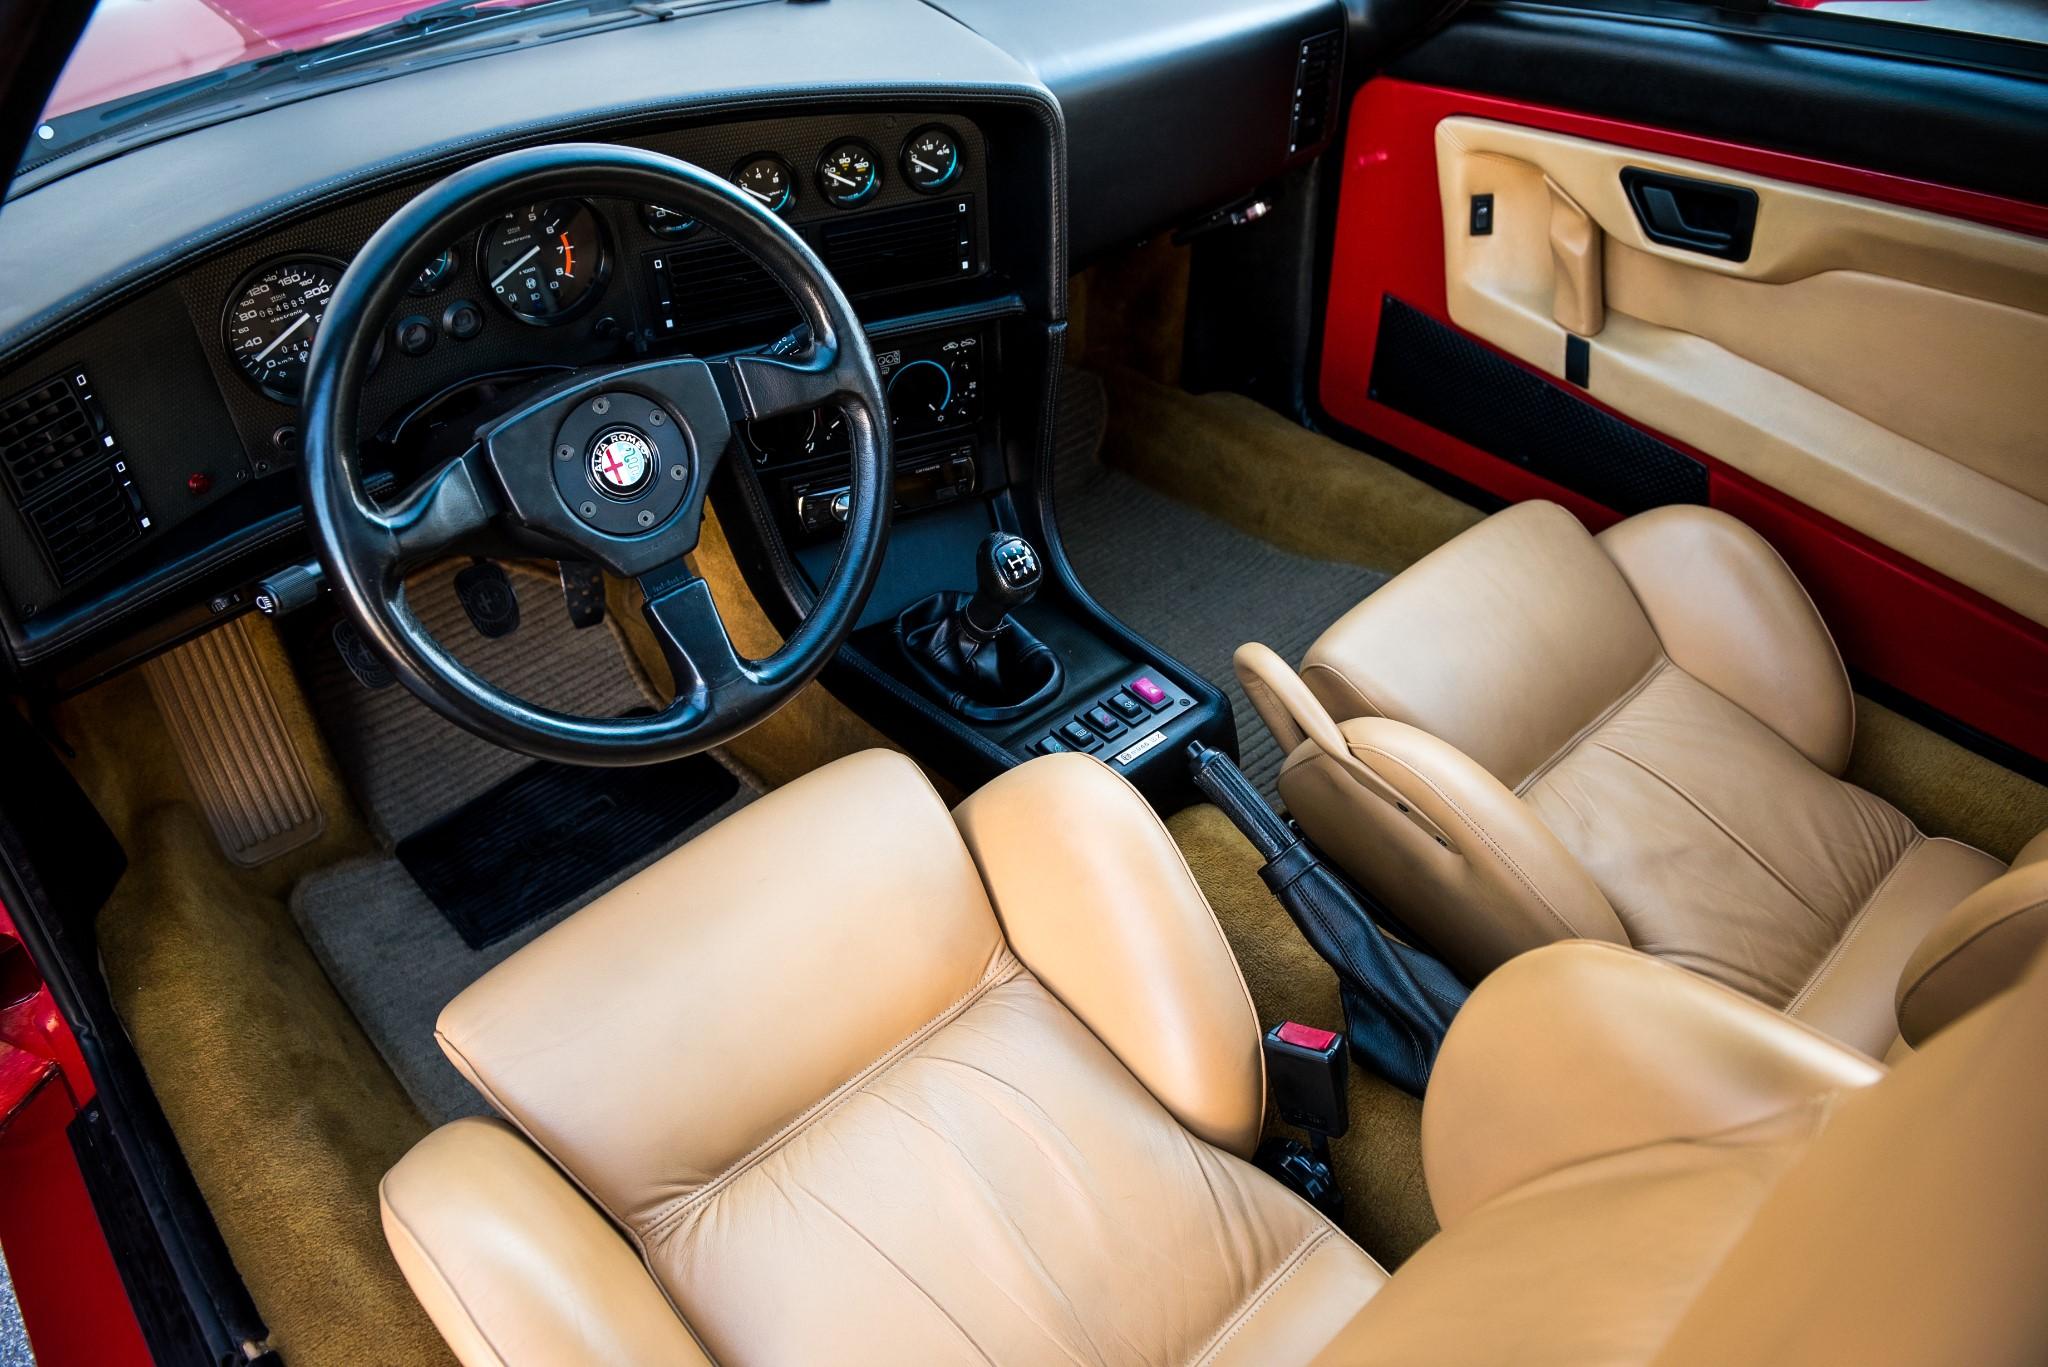 1991 Alfa Romeo SZ interior